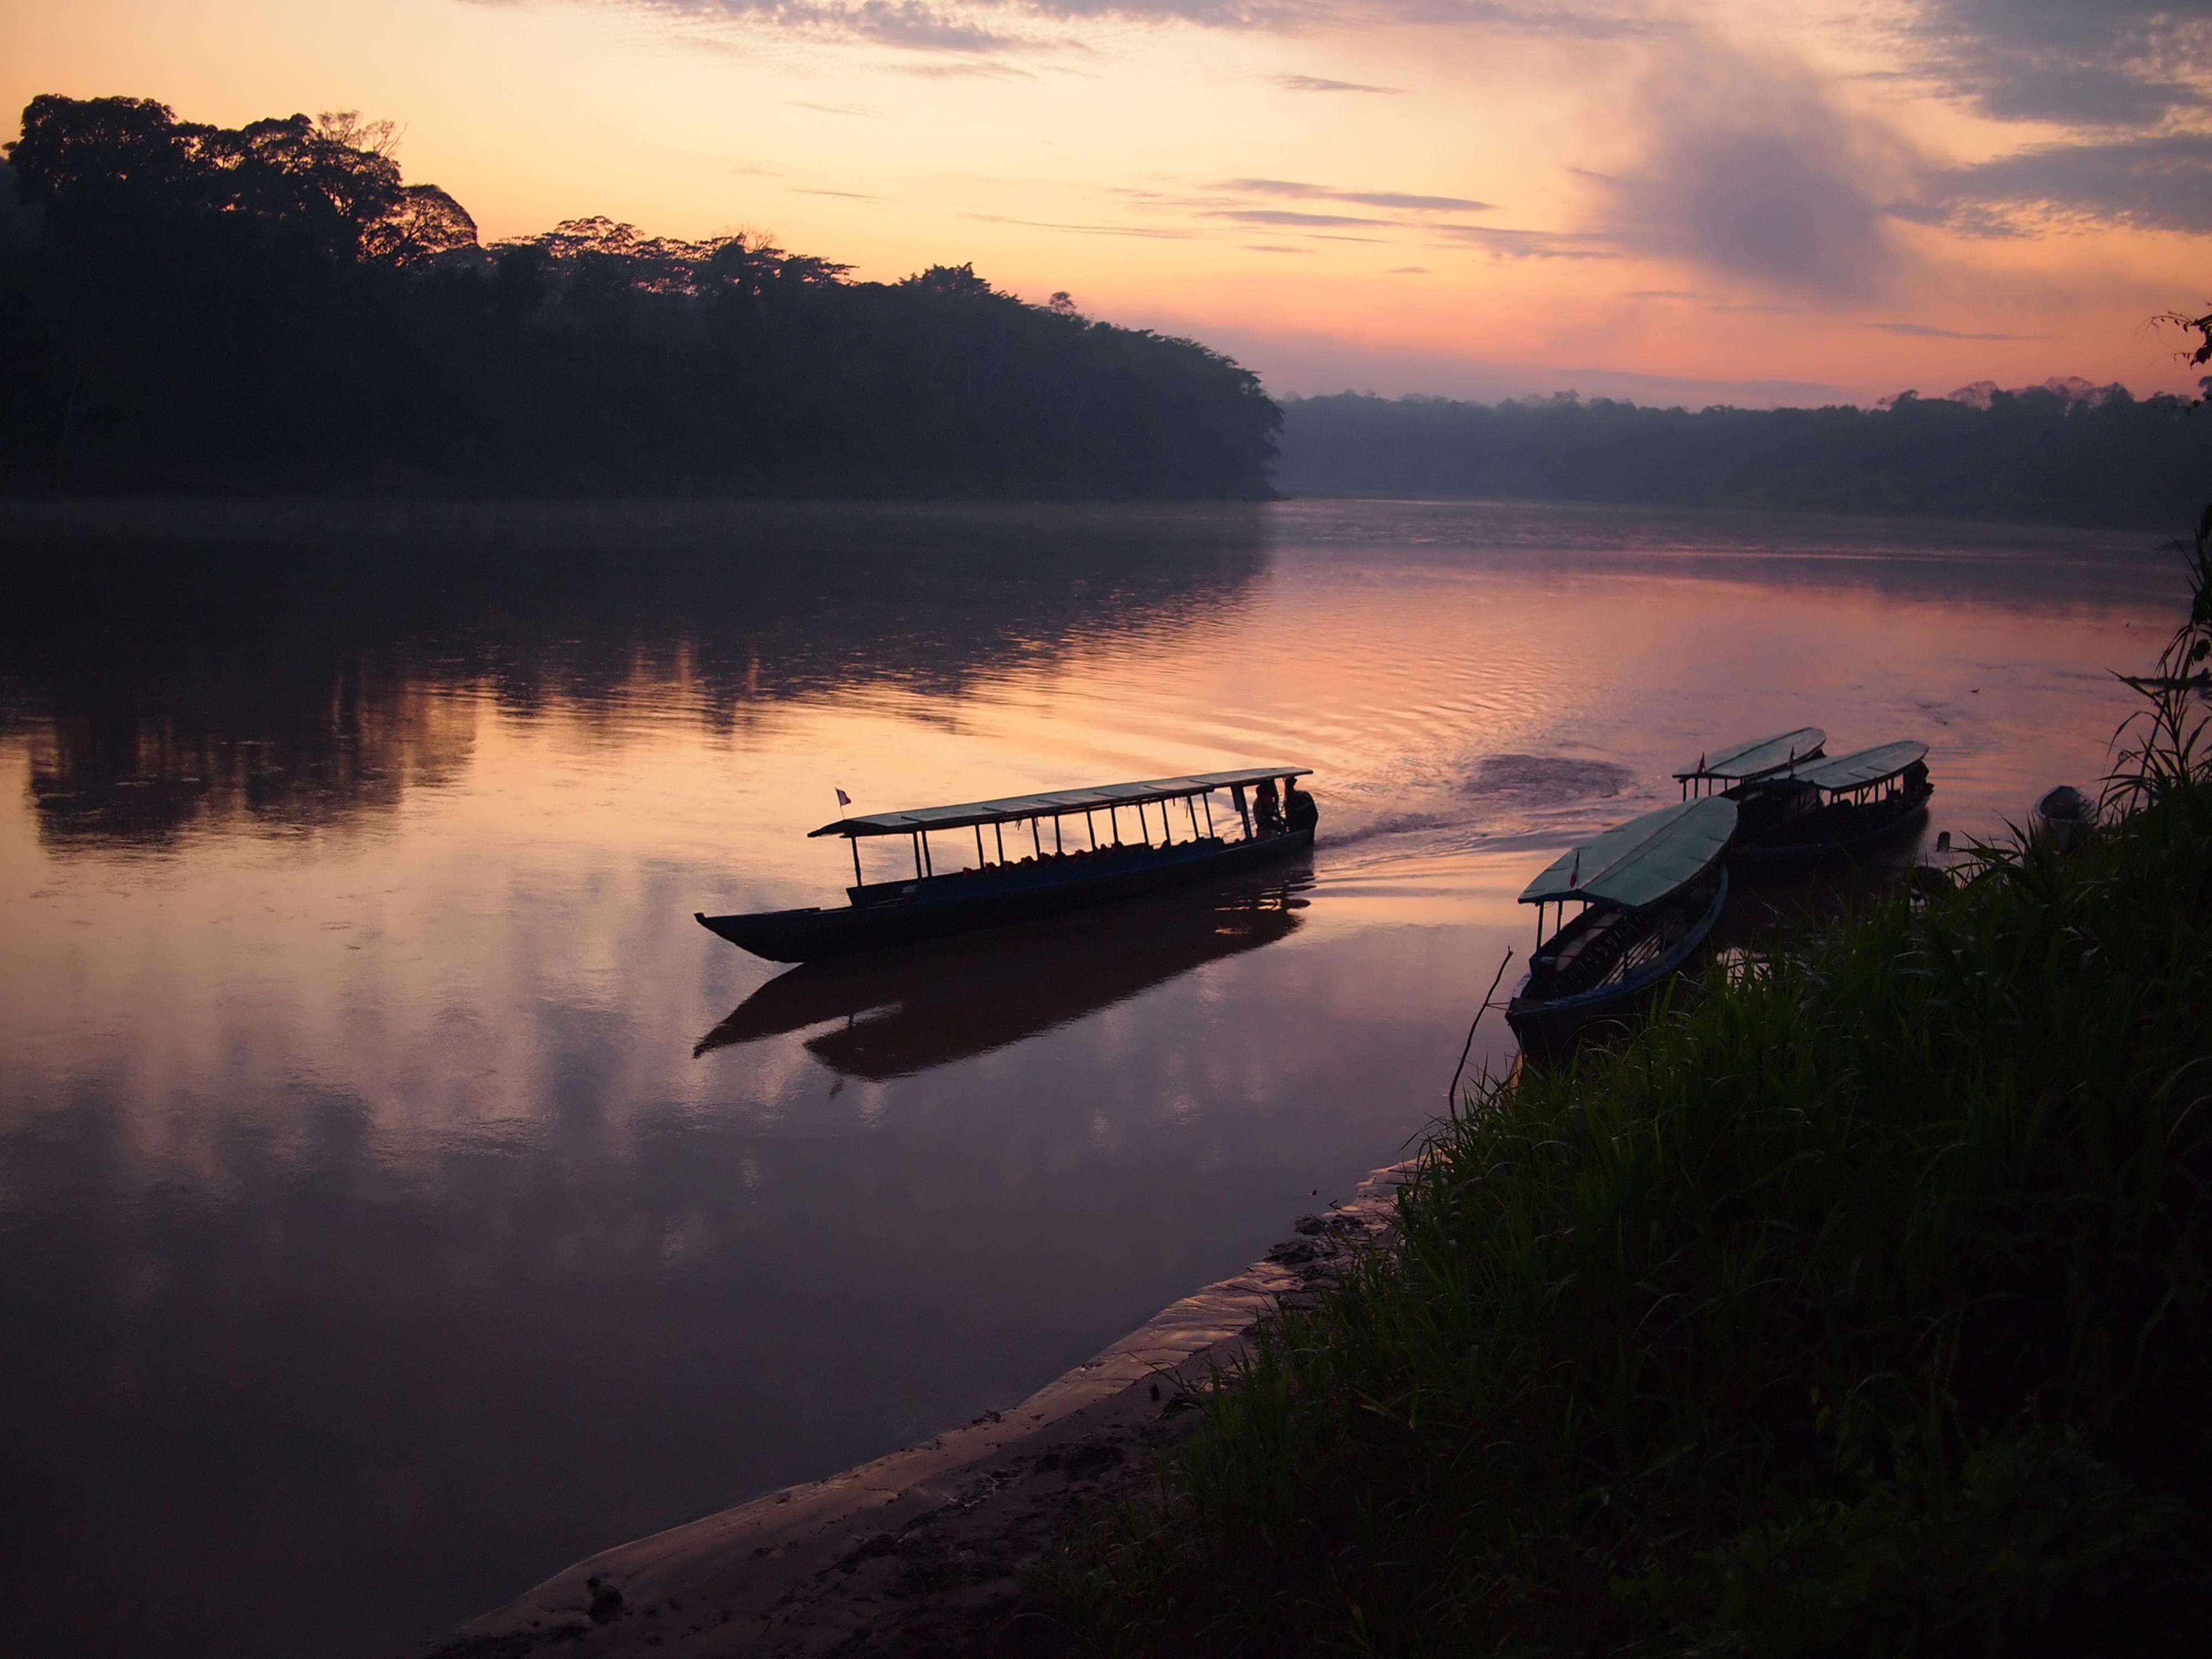 http://www.dreamstime.com/royalty-free-stock-images-amazon-rainforest-sunrise-image22319009